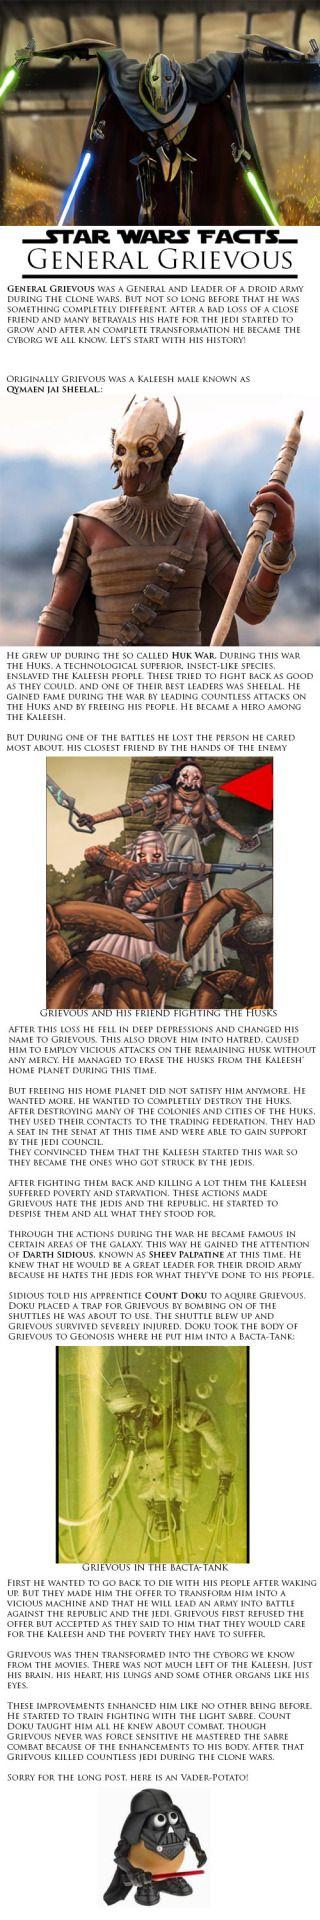 Star Wars Facts Part II ..